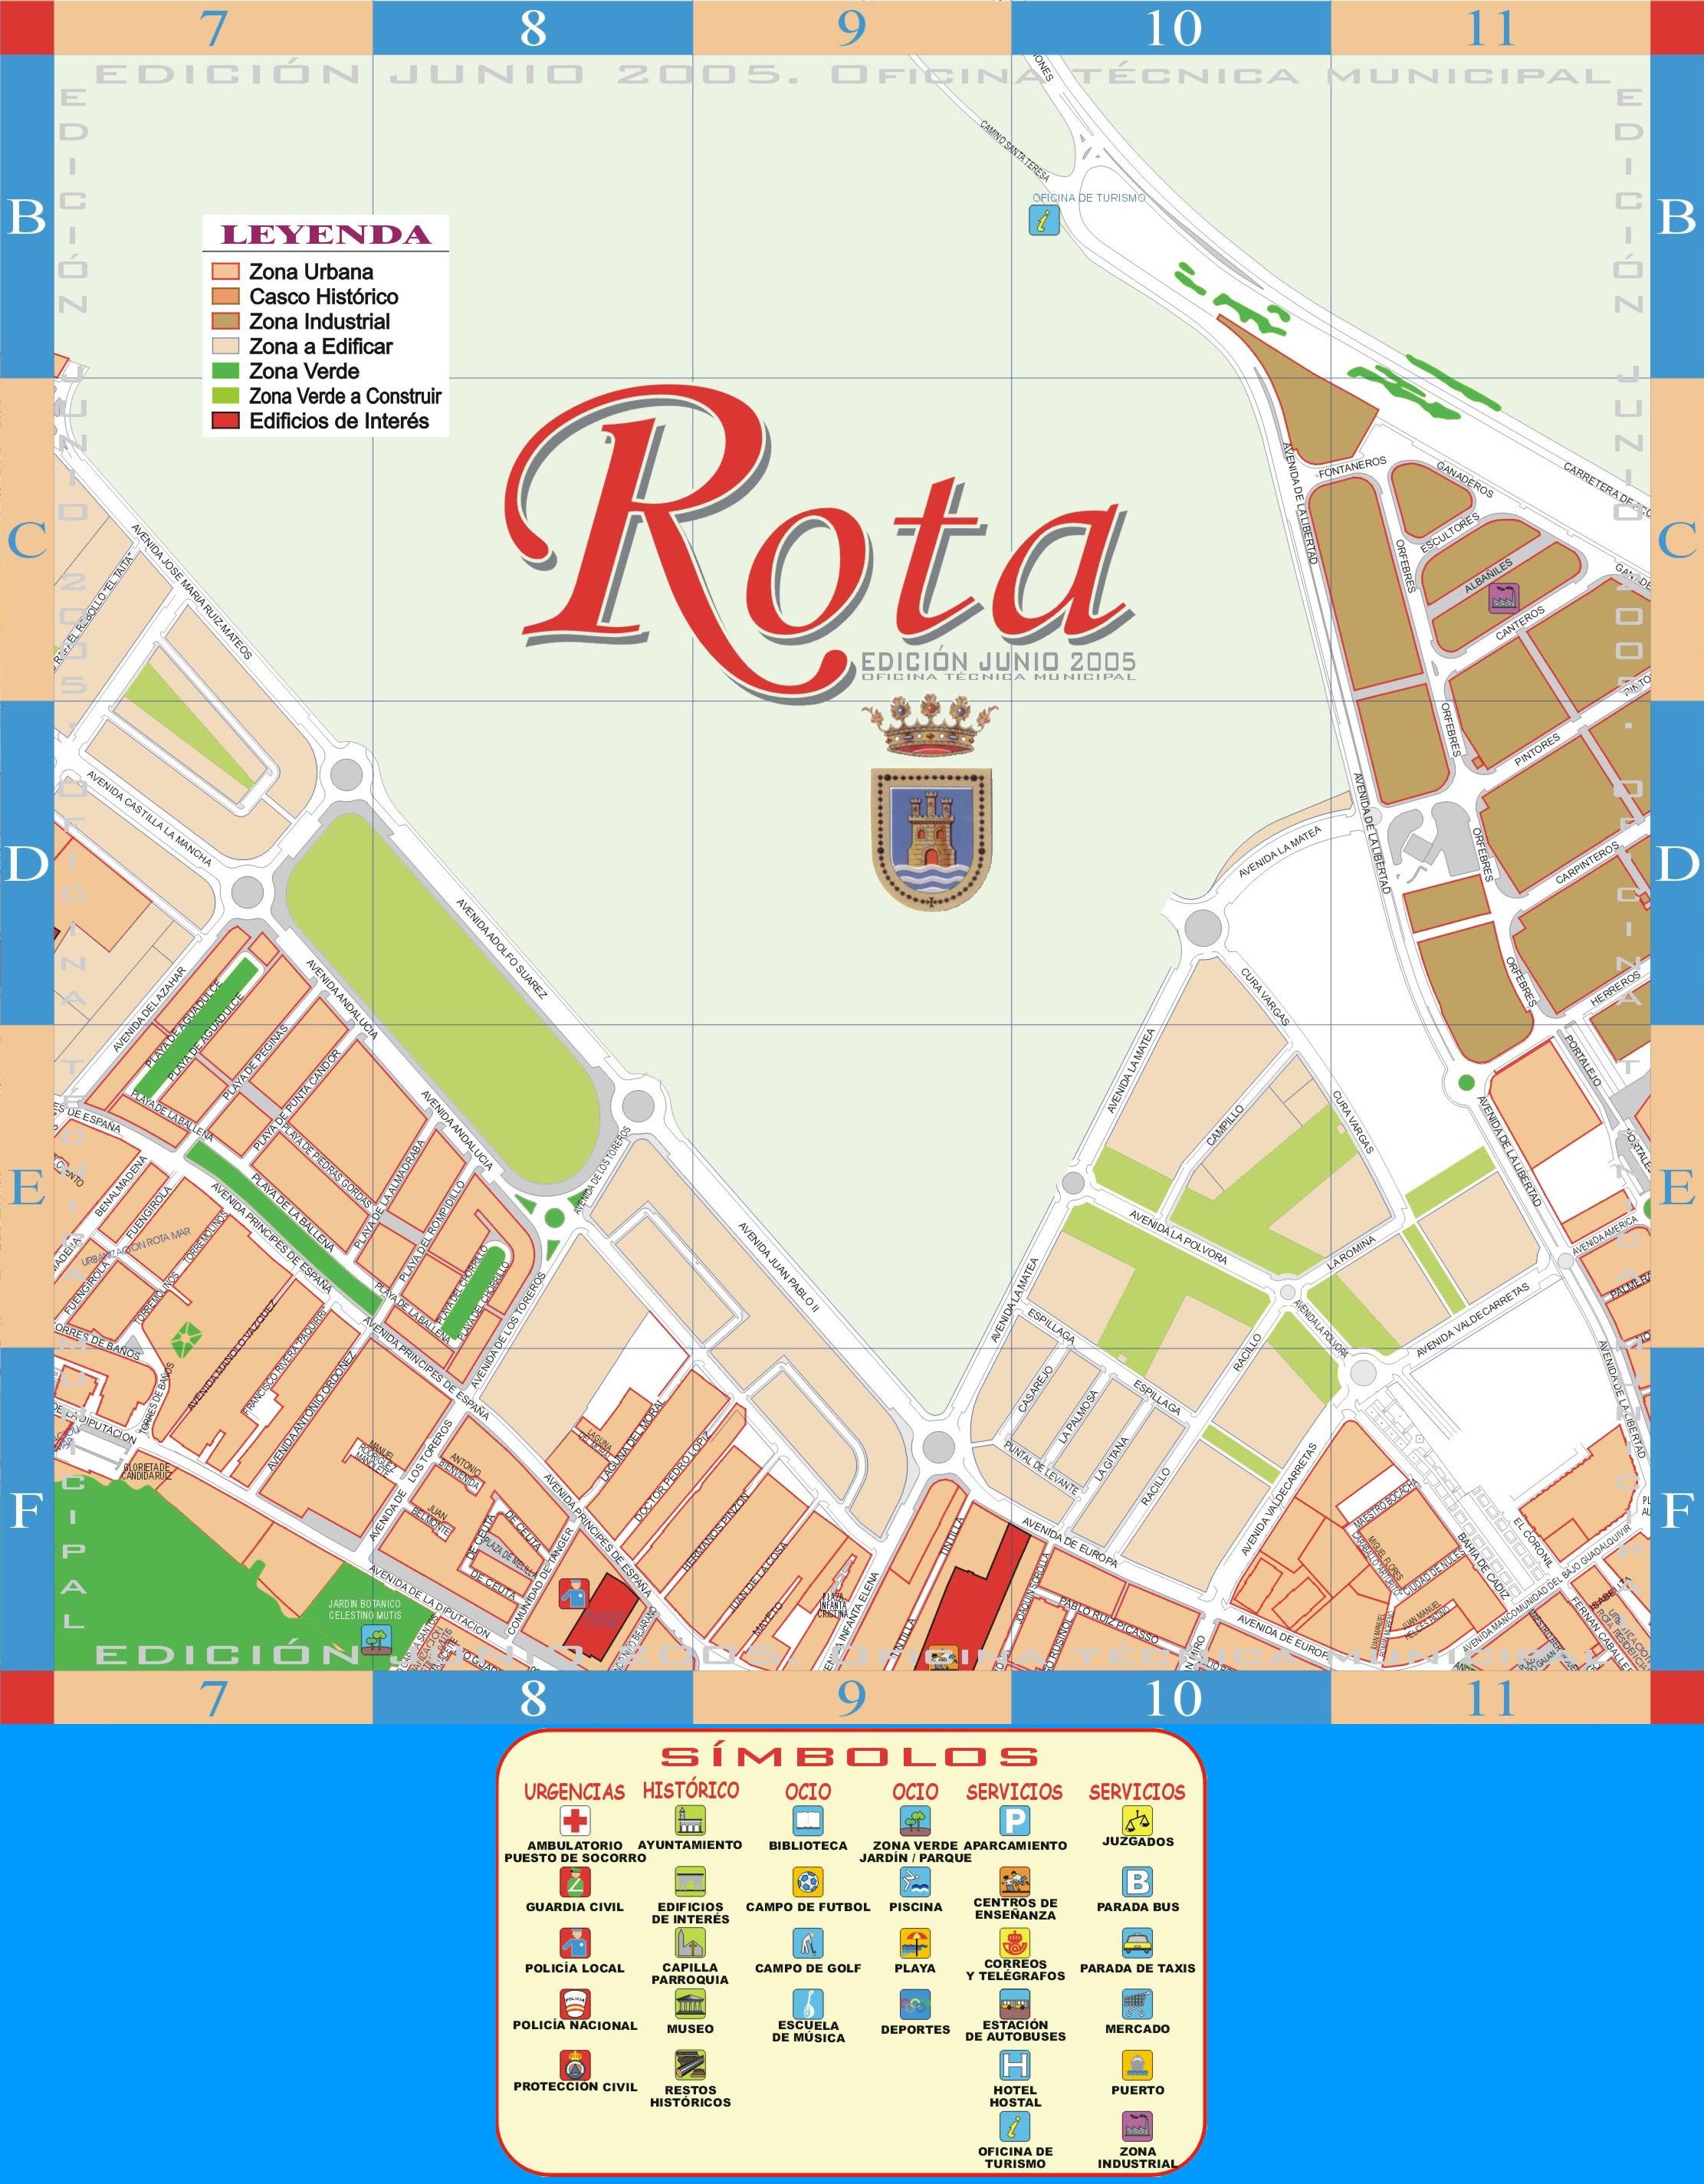 Rota map 2005 - part 2